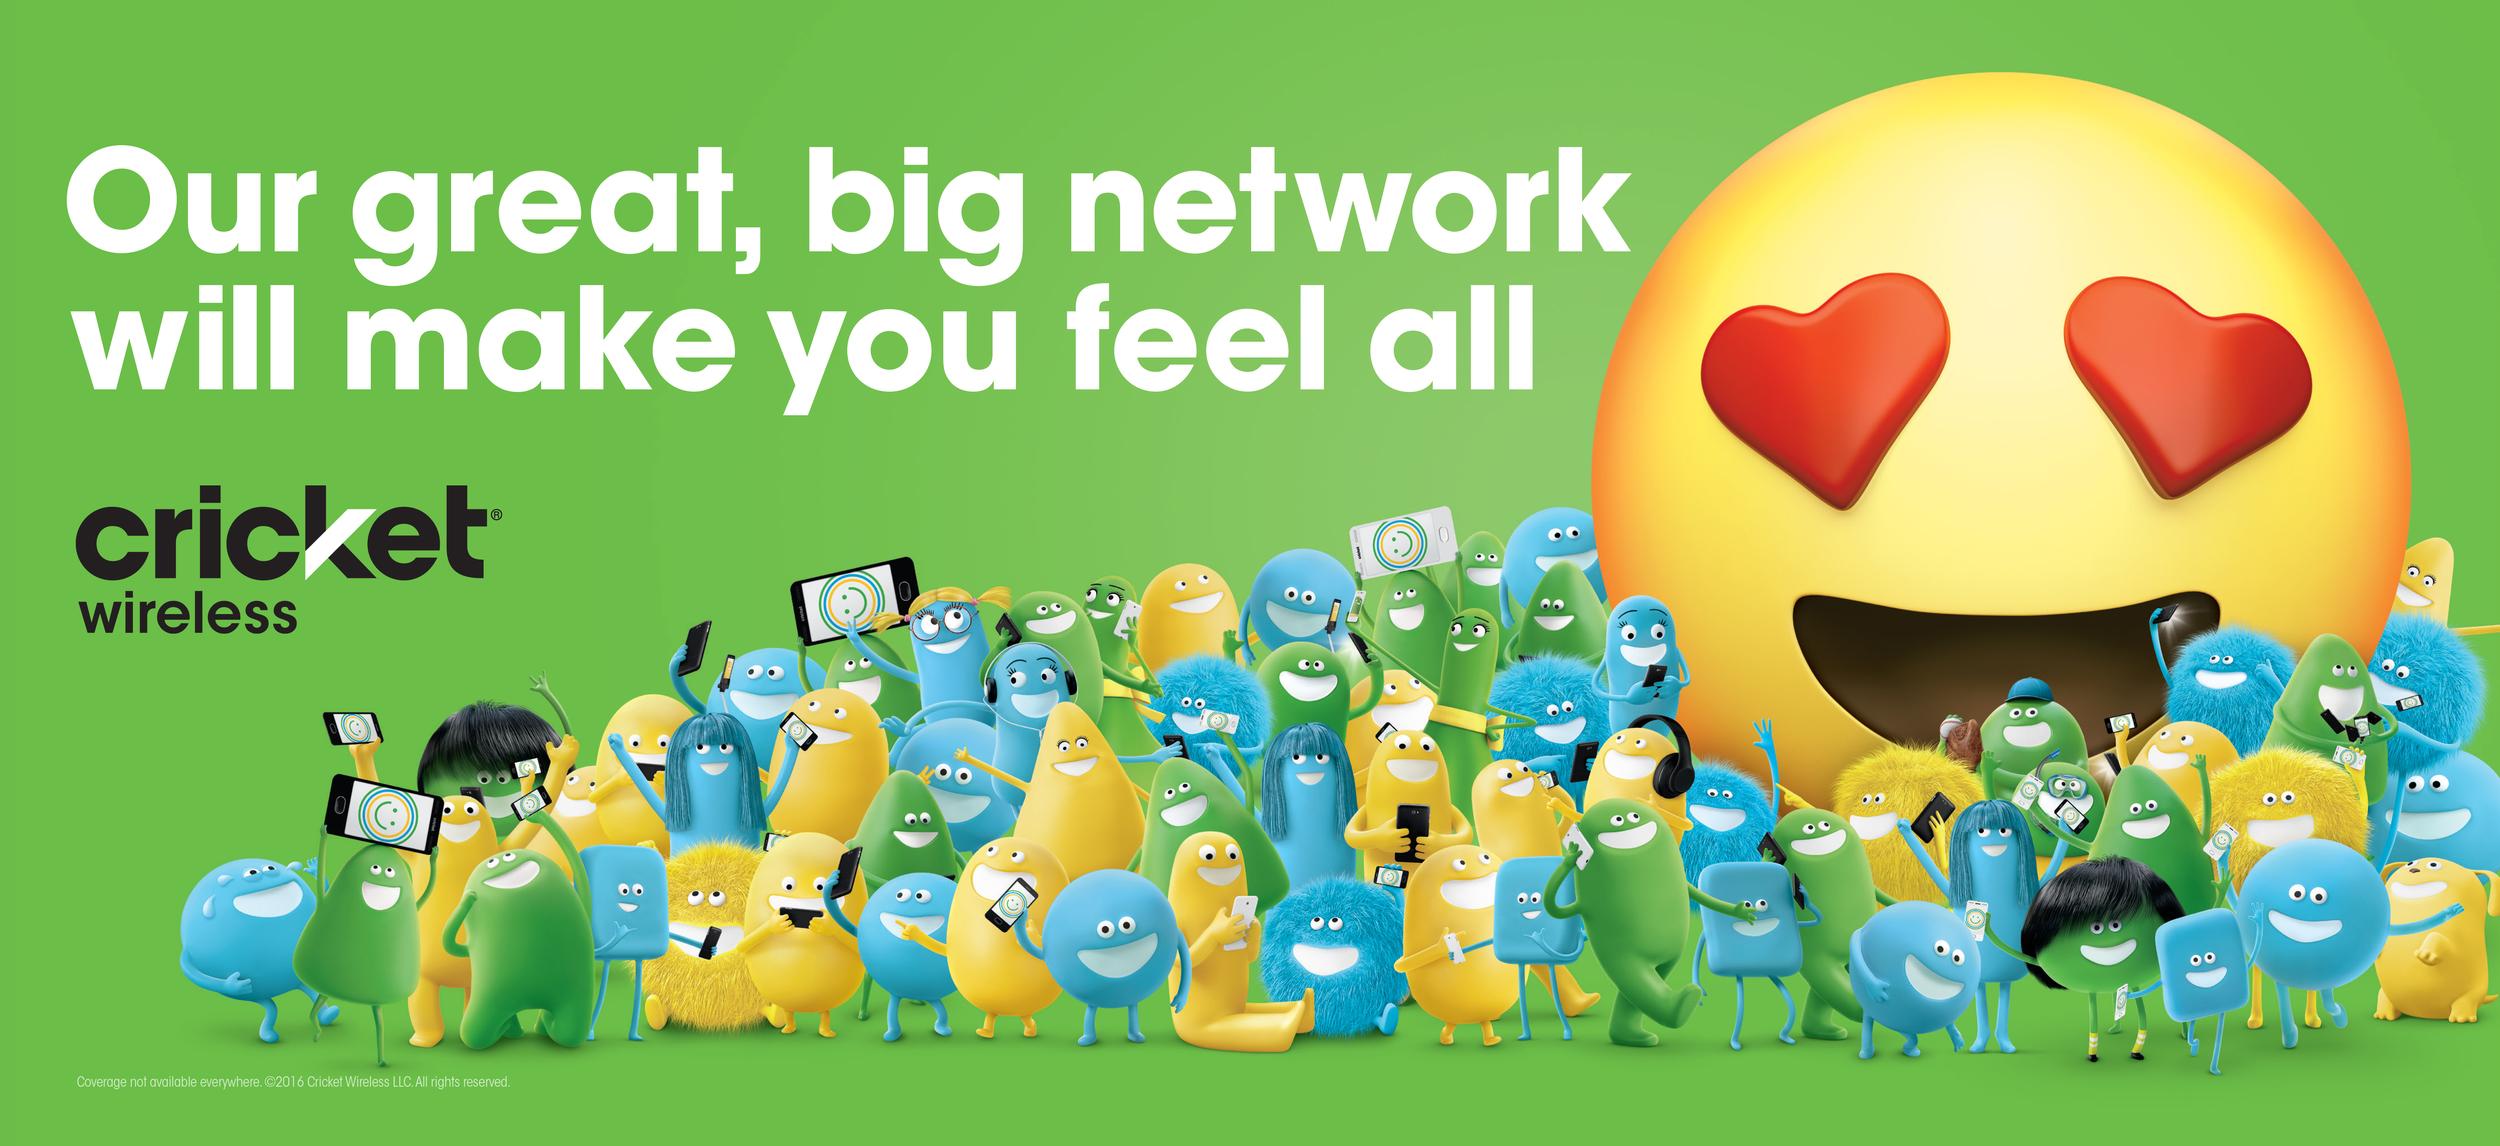 Z22697_2d_Great+Big+Network+MBB+22x10_MedRes.jpg